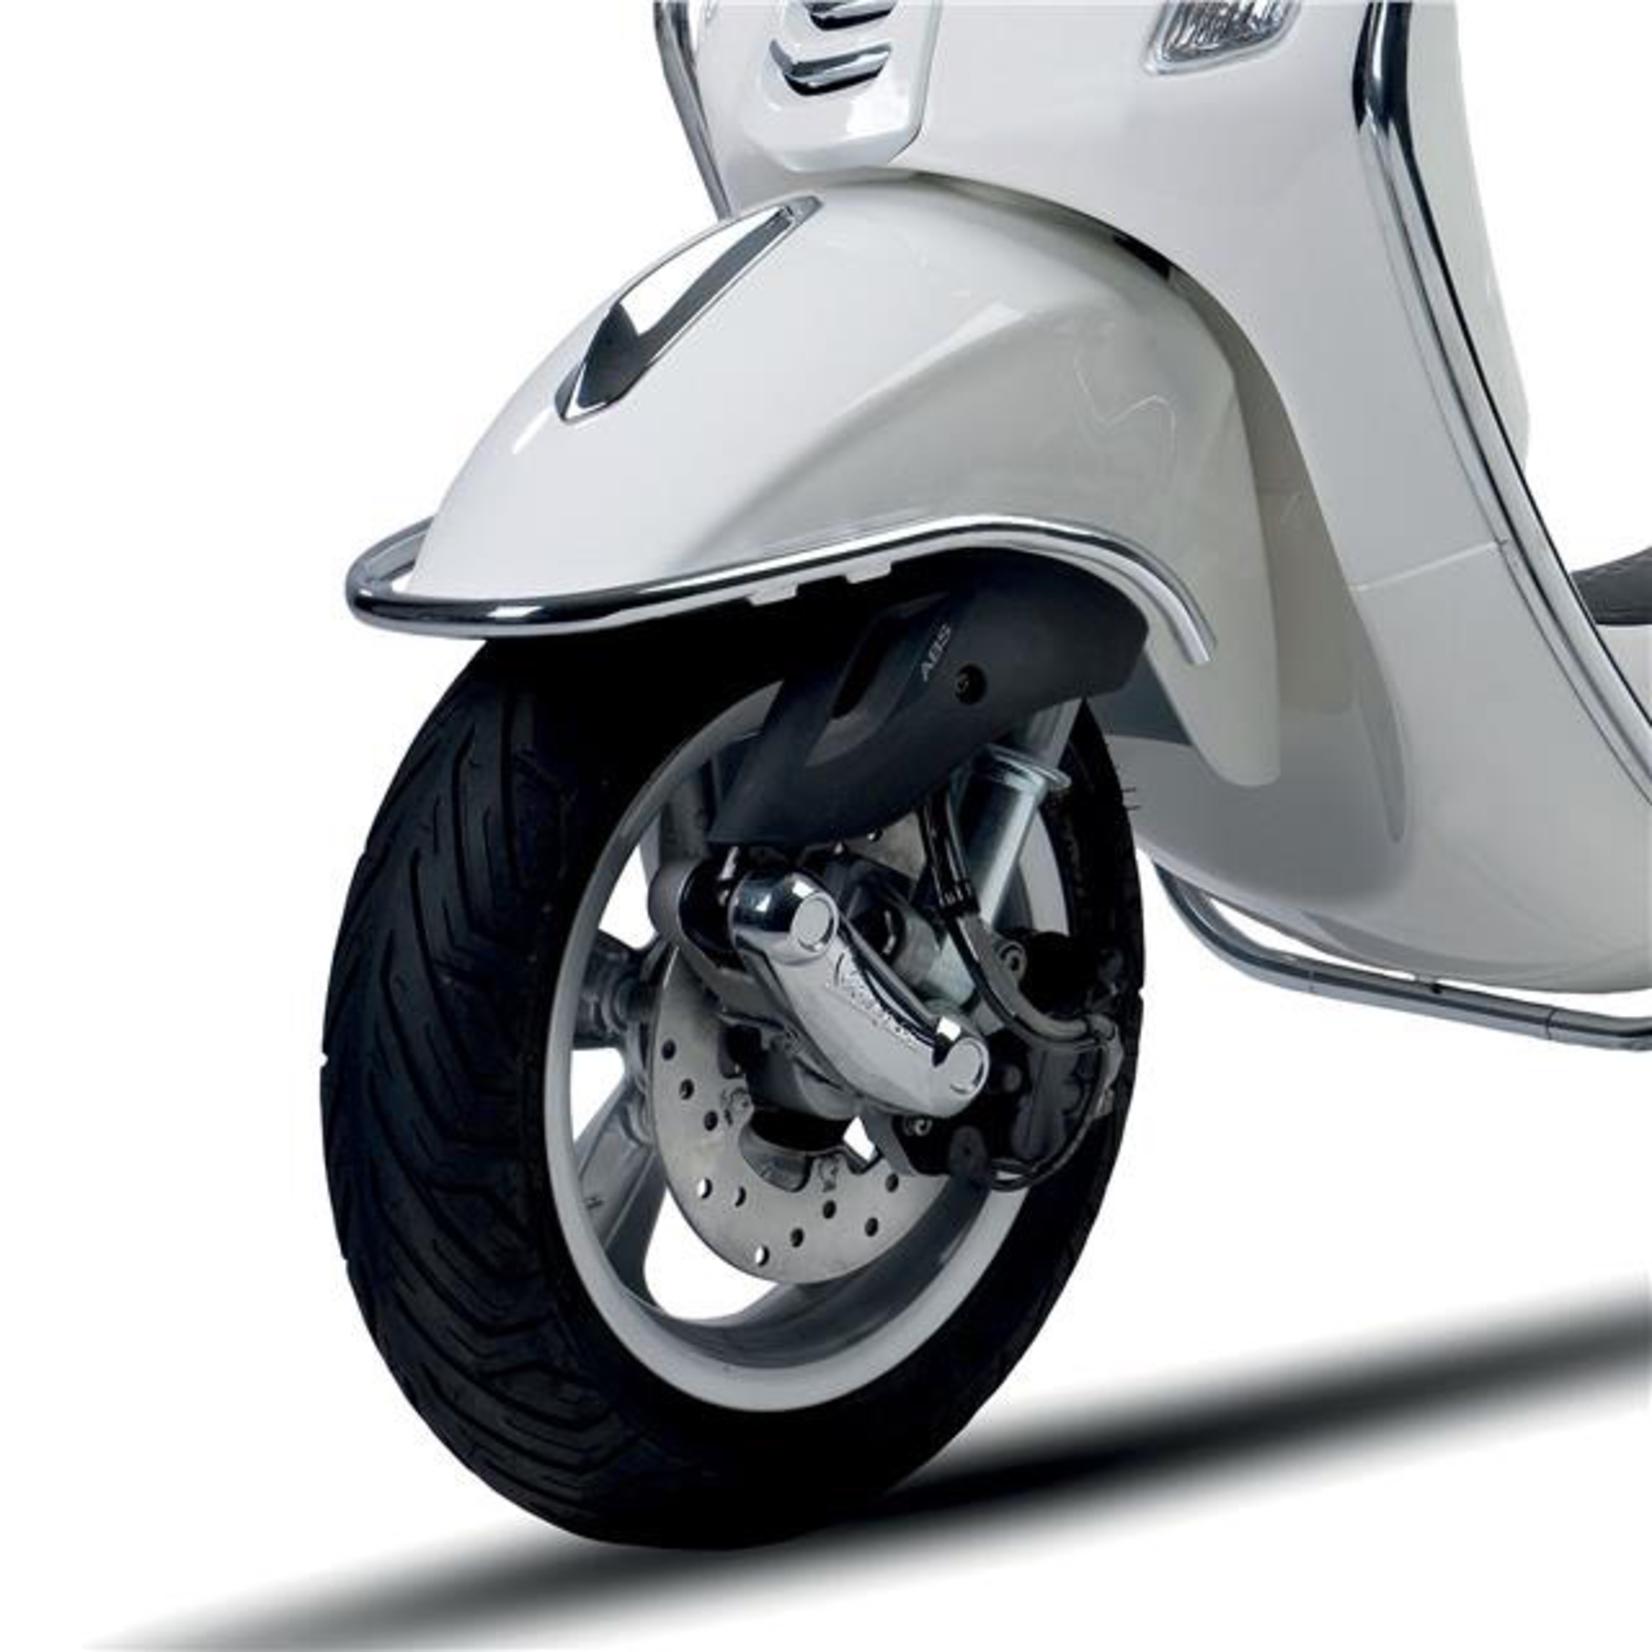 Accessories Protector, Primavera/Sprint Front Fender